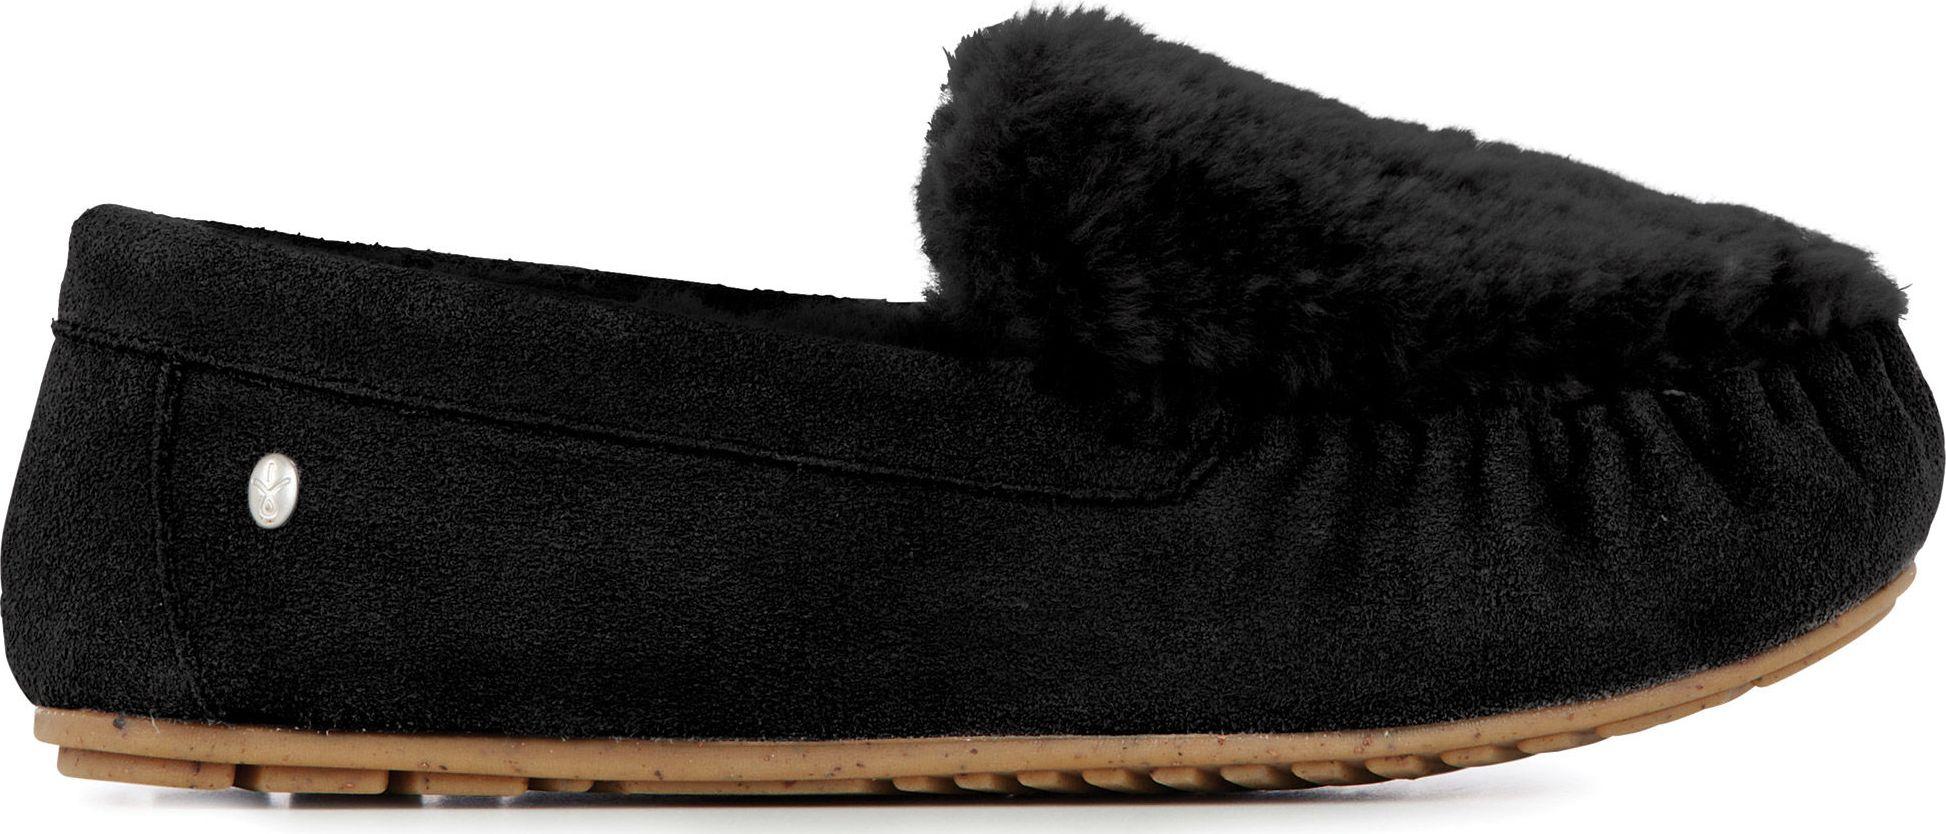 EMU Australia Cairns Reverse Fur Black 38